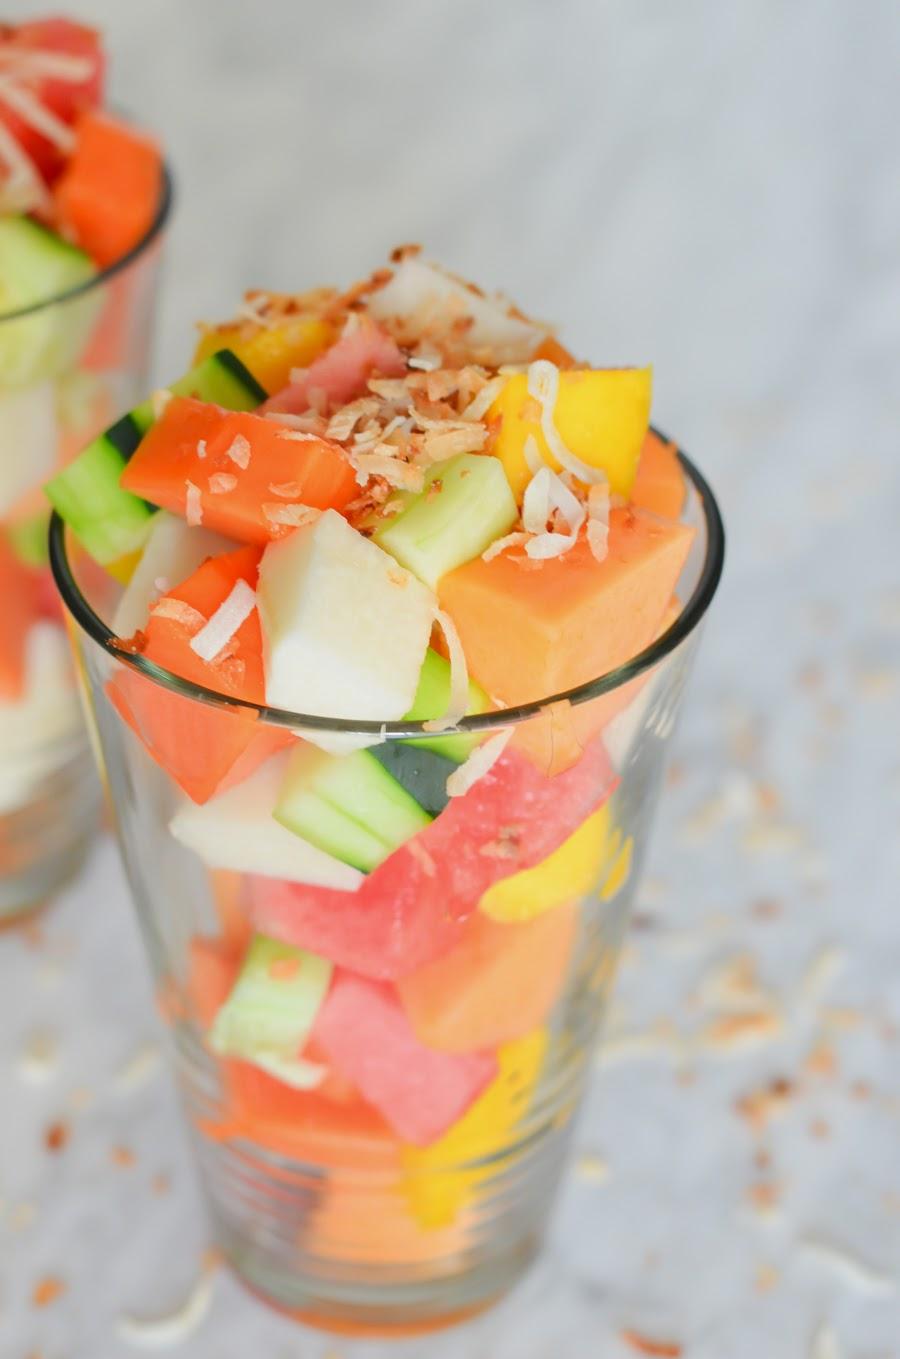 Los Angeles Fruit Cart Salad w. Mango, Papaya, Watermelon, Jicama, & Cucumber Summer Recipe   Luci's Morsels :: LA Food Blogger